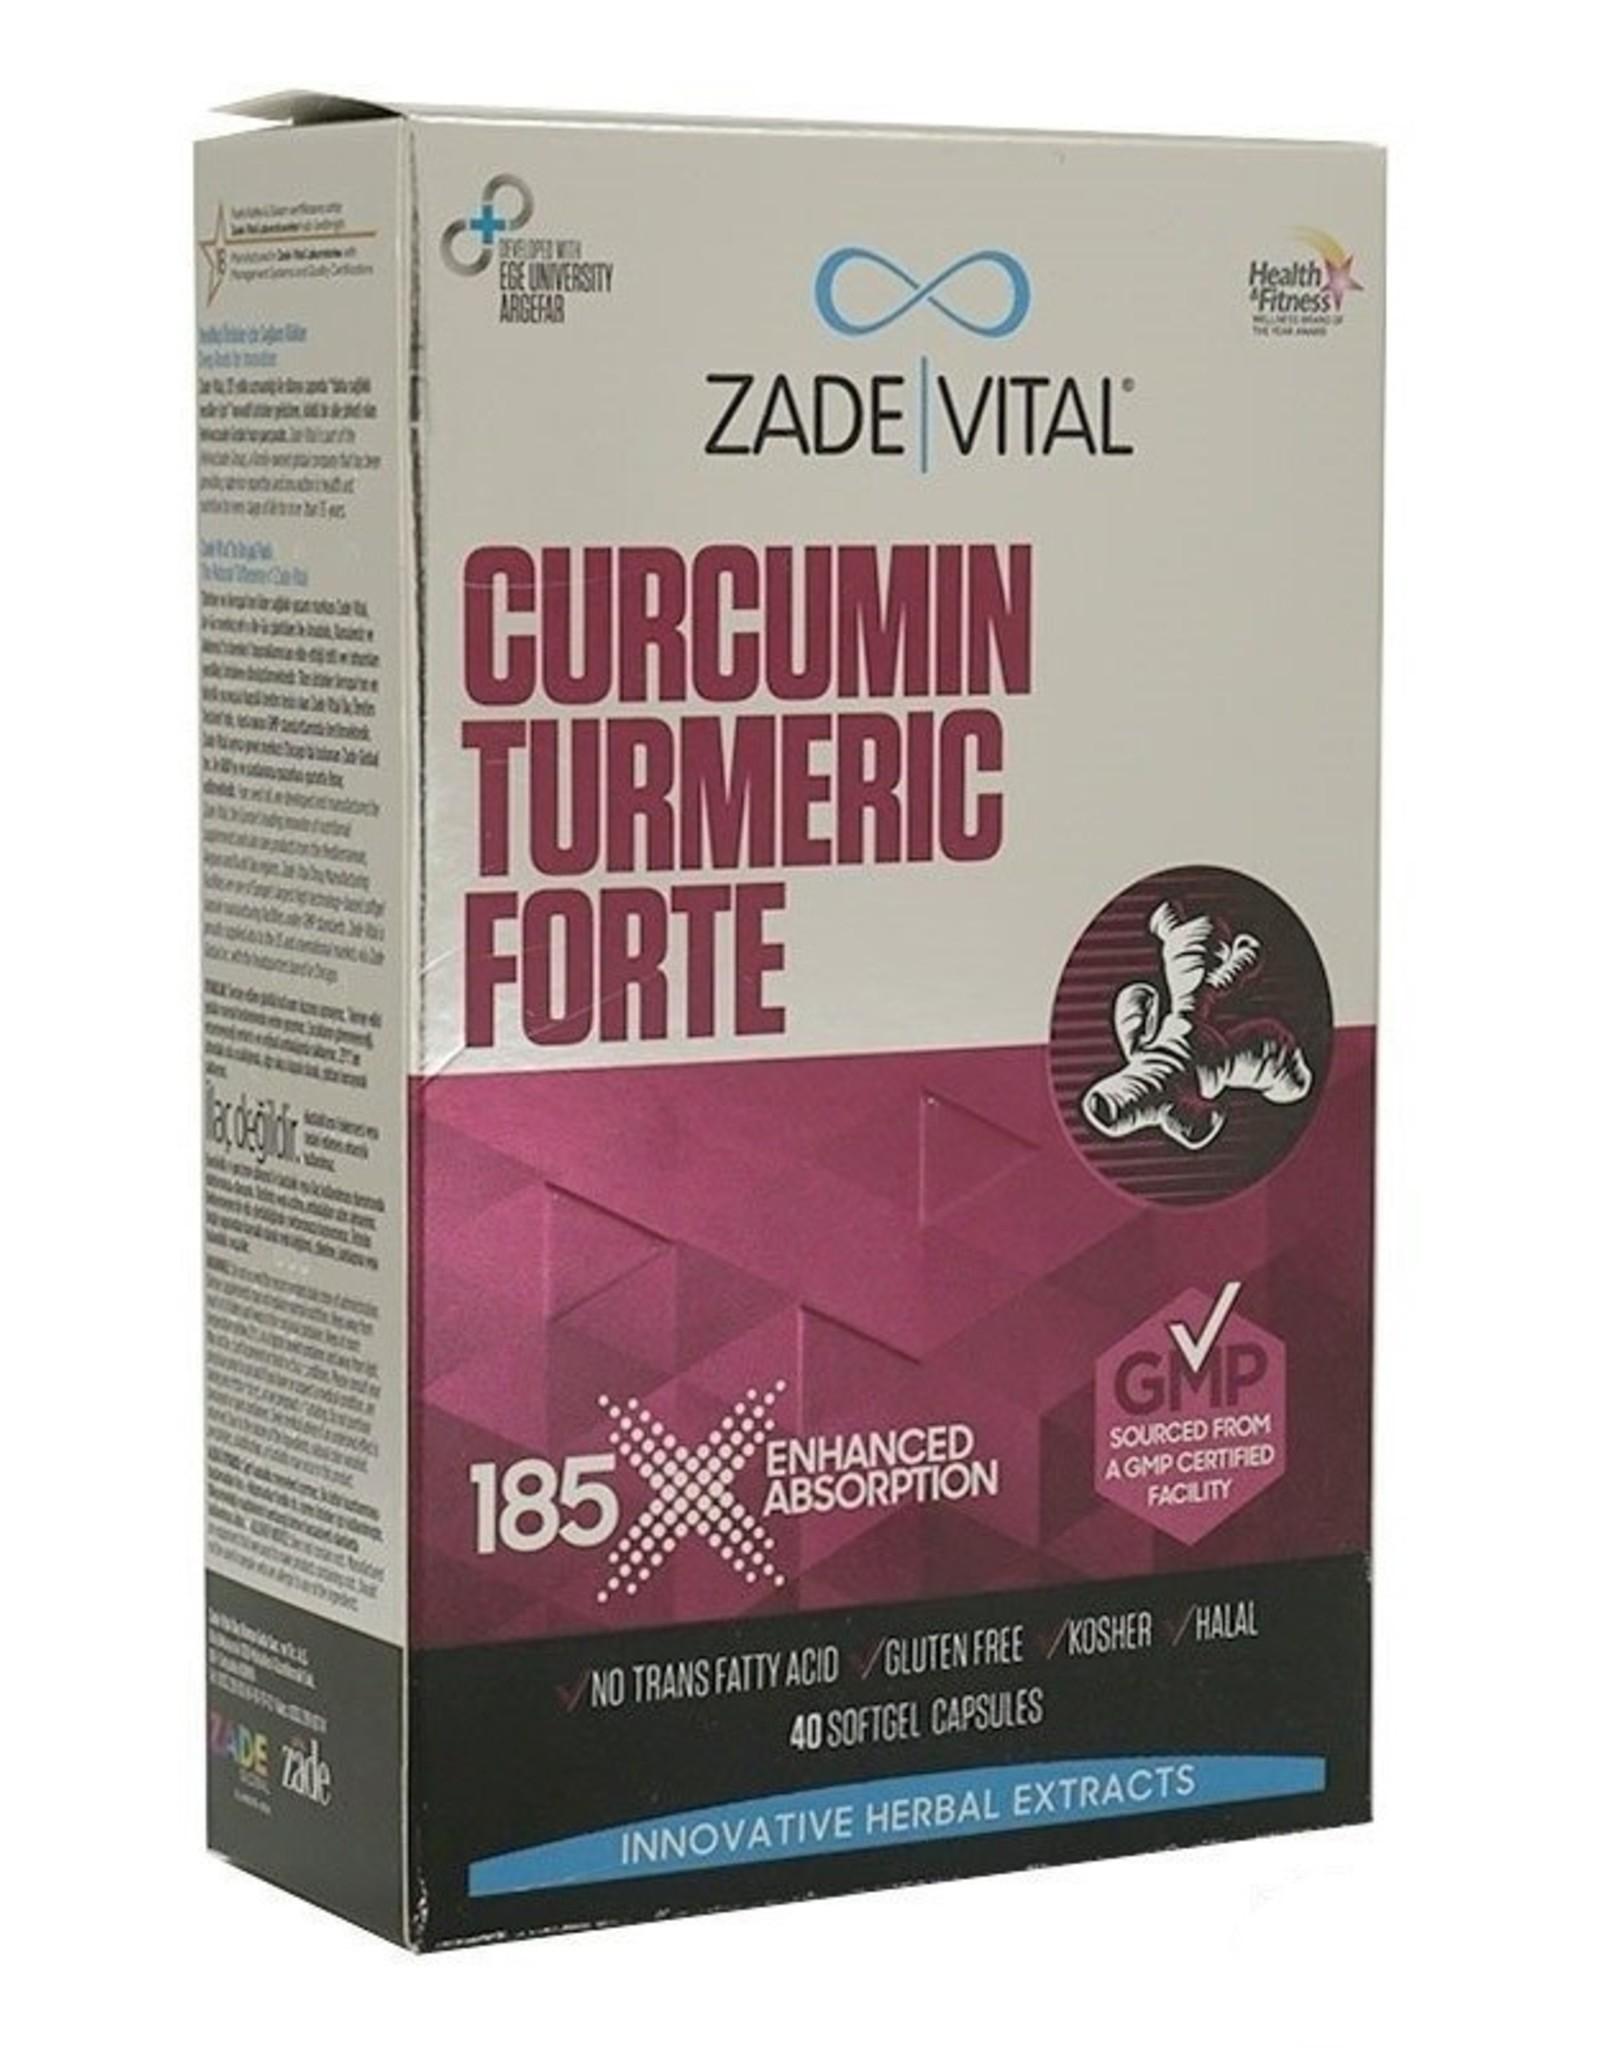 Zade Vital Zade Vital Curcumin Forte - Zerdeçal 1000 Mg 40 Kapsül